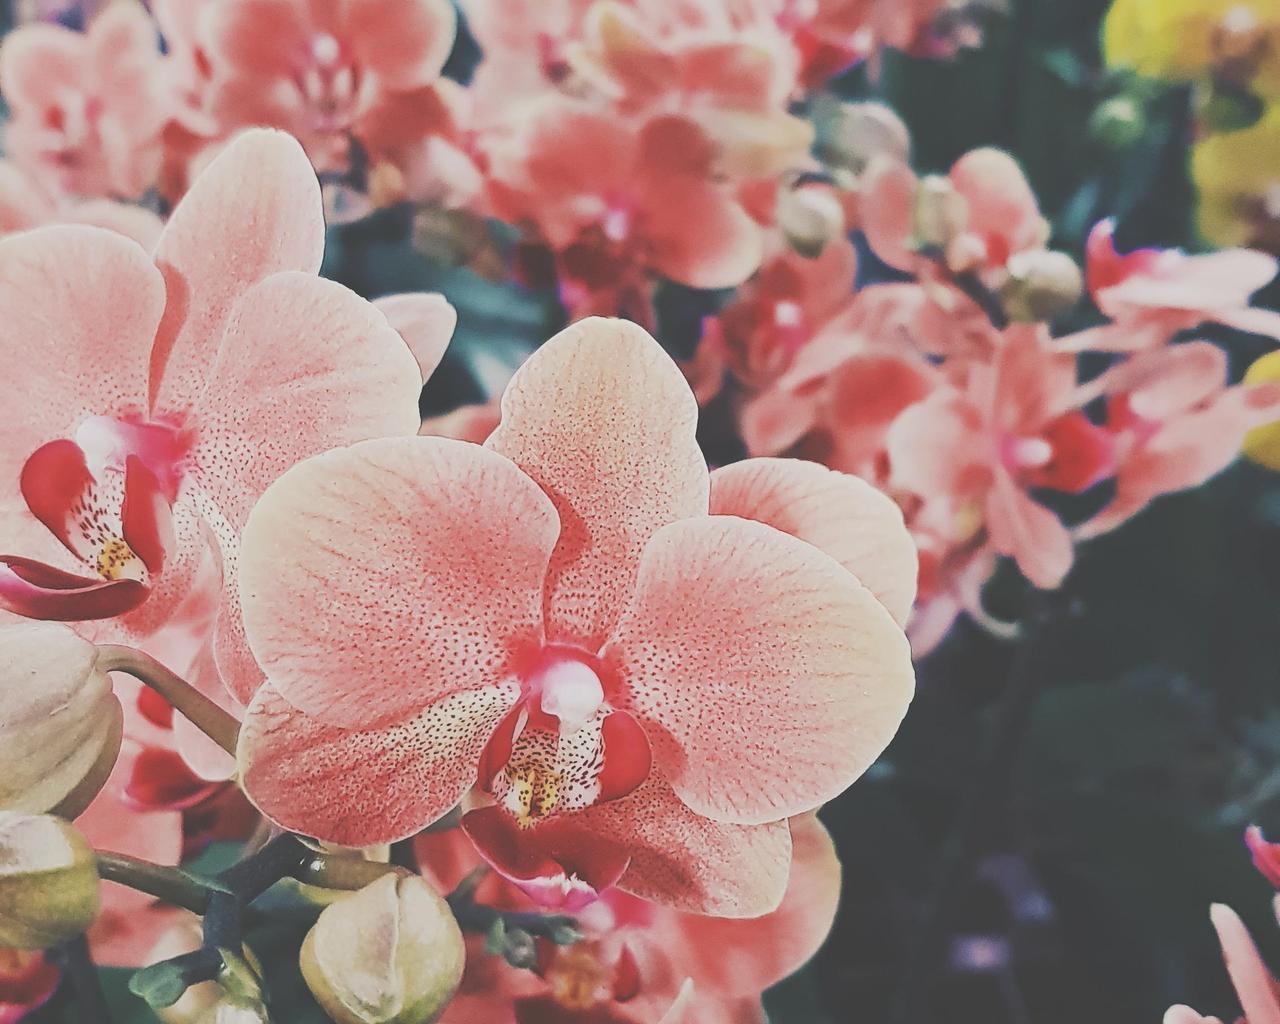 Free download Ari Rachel images aesthetic flowers HD